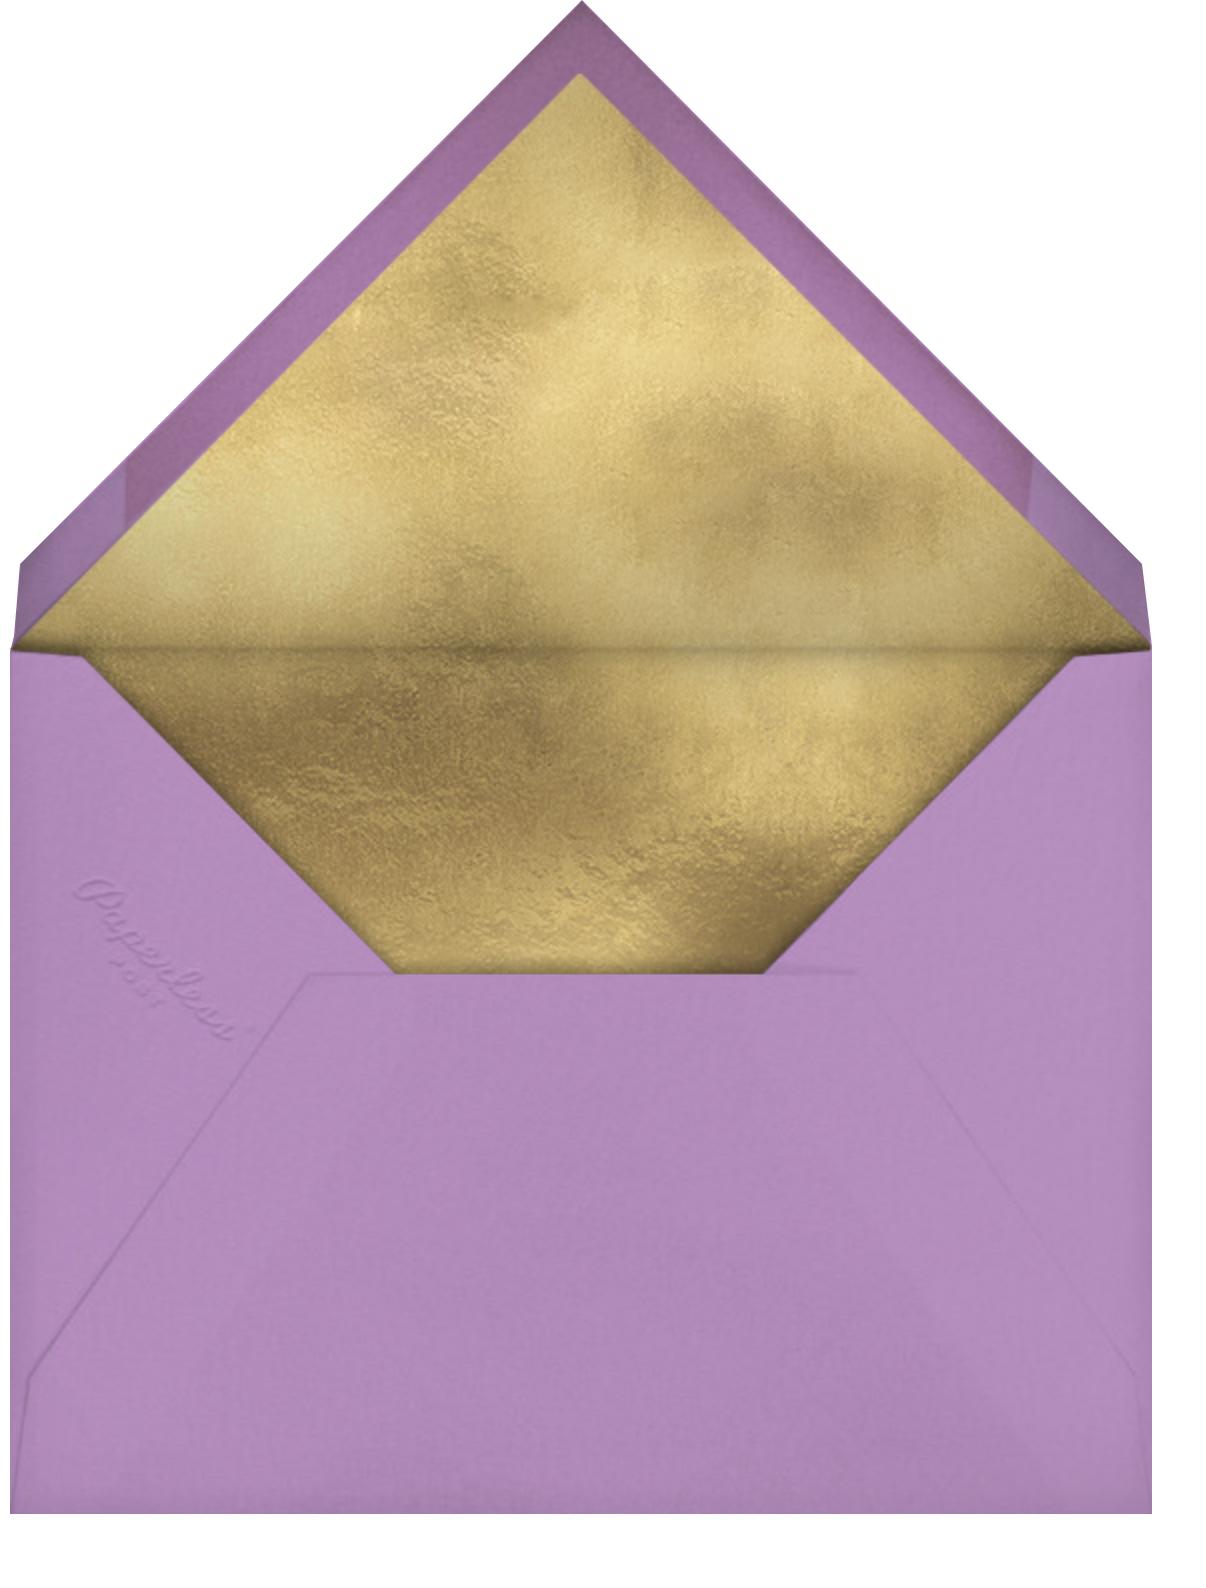 Year of the Sparkler - Gold/White - Paperless Post - Envelope